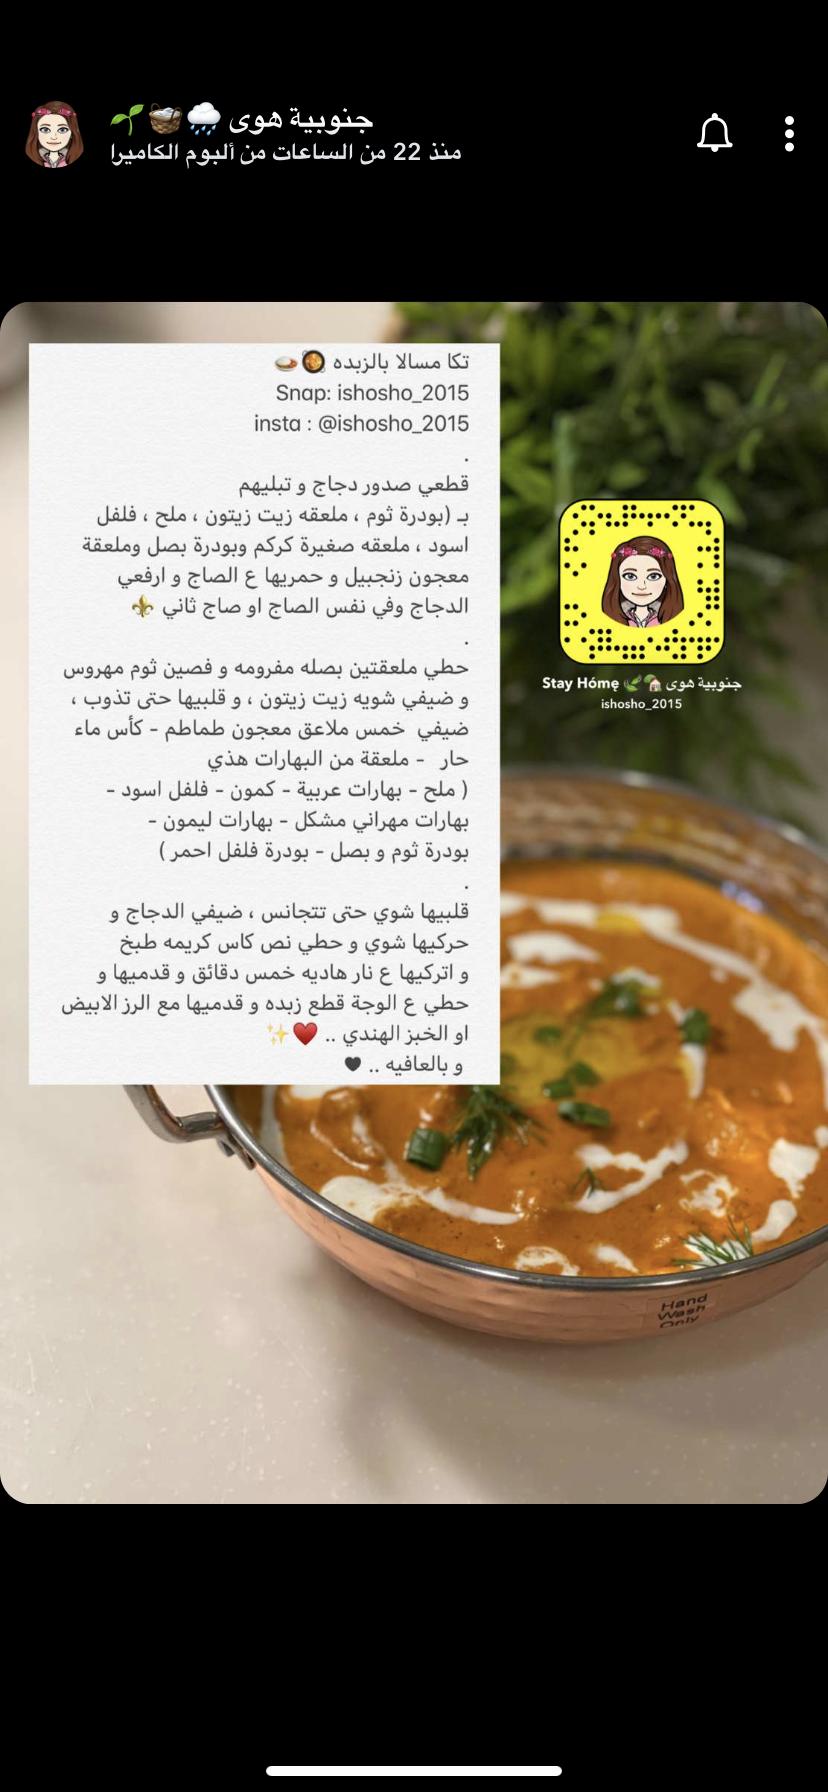 Pin By Najd Alotebi On تجميع طبخات مالح Cooking Recipes Desserts Cooking Recipes Arabian Food